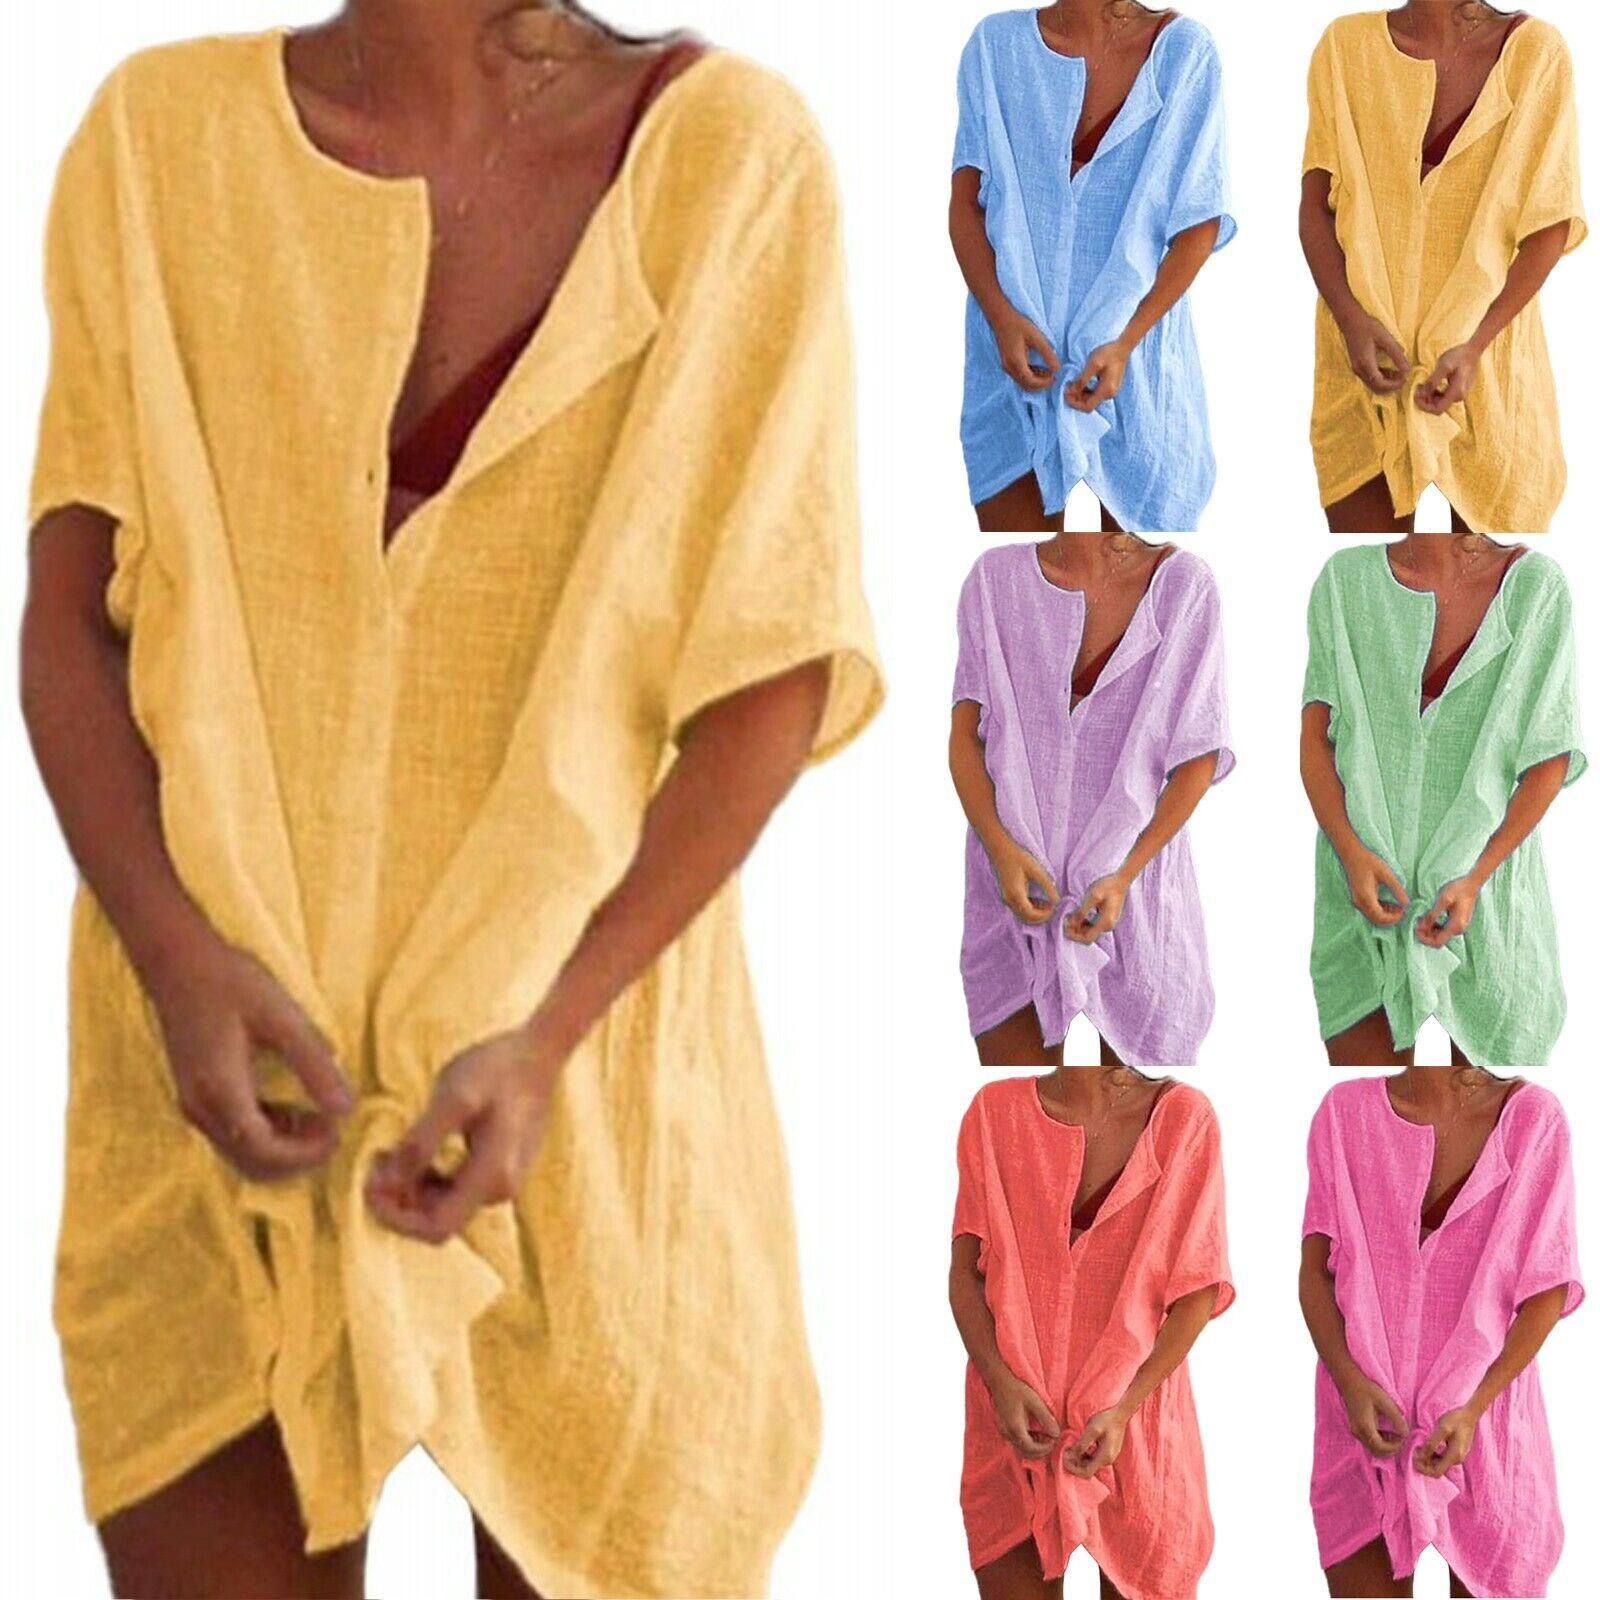 Plus Size Womens Cotton Linen Summer Beach Mini Dress Holiday T-Shirt Tunic Tops